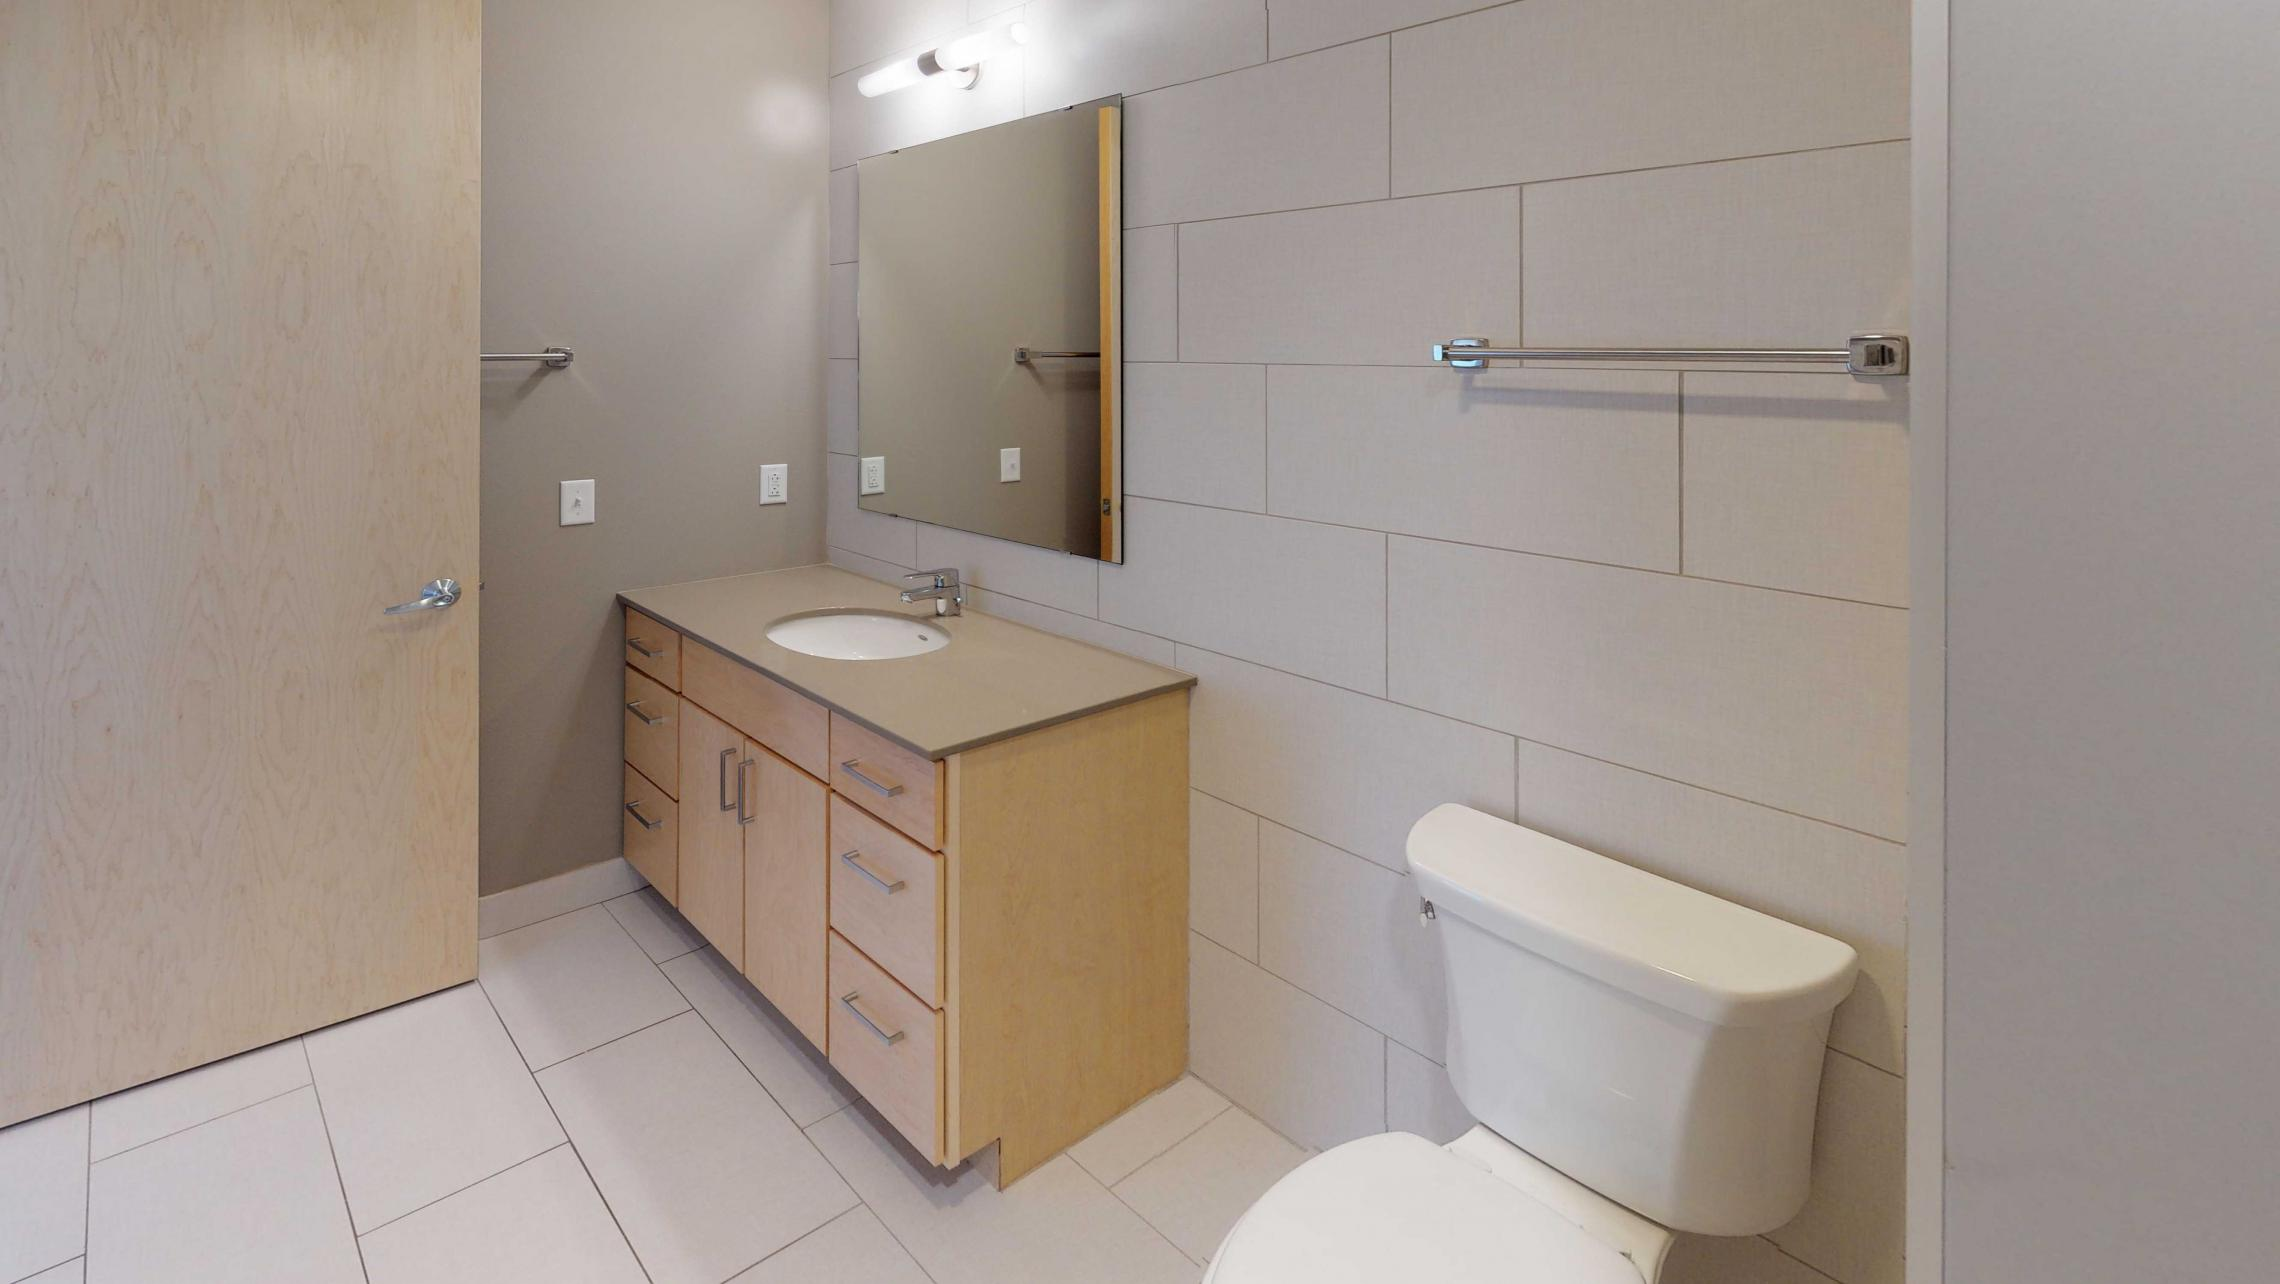 Nine-Line-Apartment-517-Modern-Bathroom-Details-Madison-Upscale-Views-Downtown.jpg